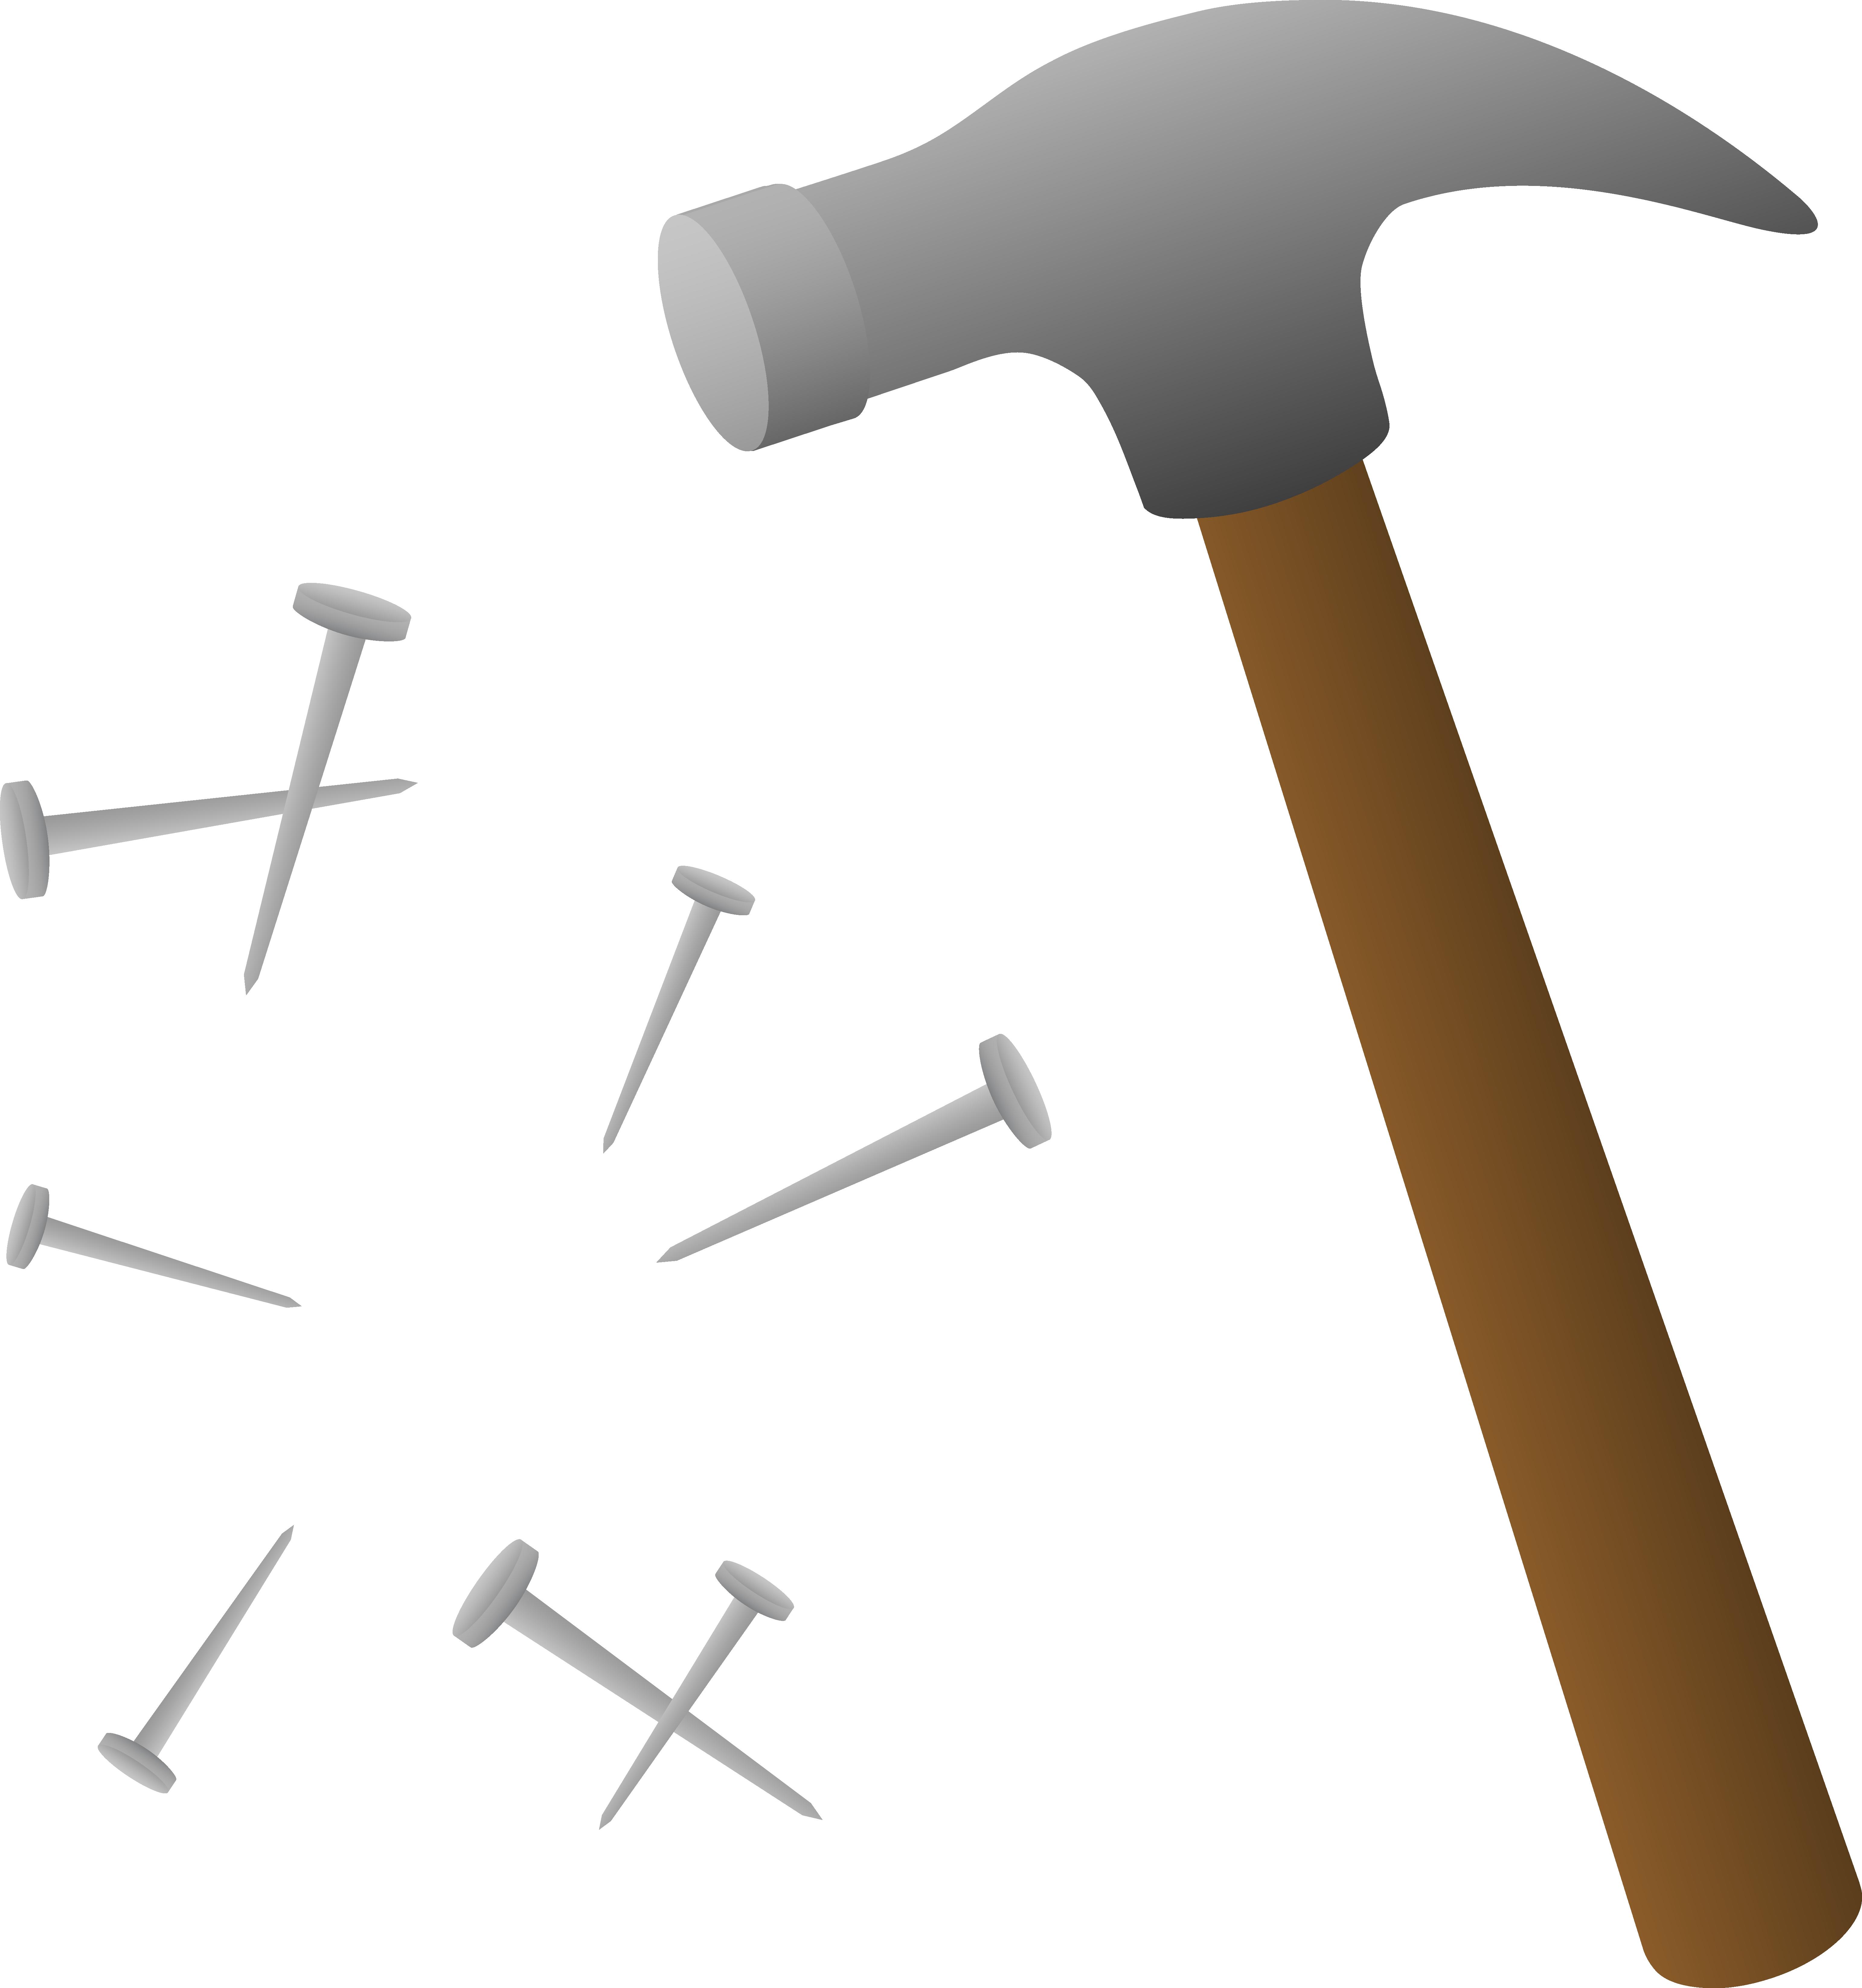 Nails clipart cartoon Hammer Nails Hammer Scattered Art